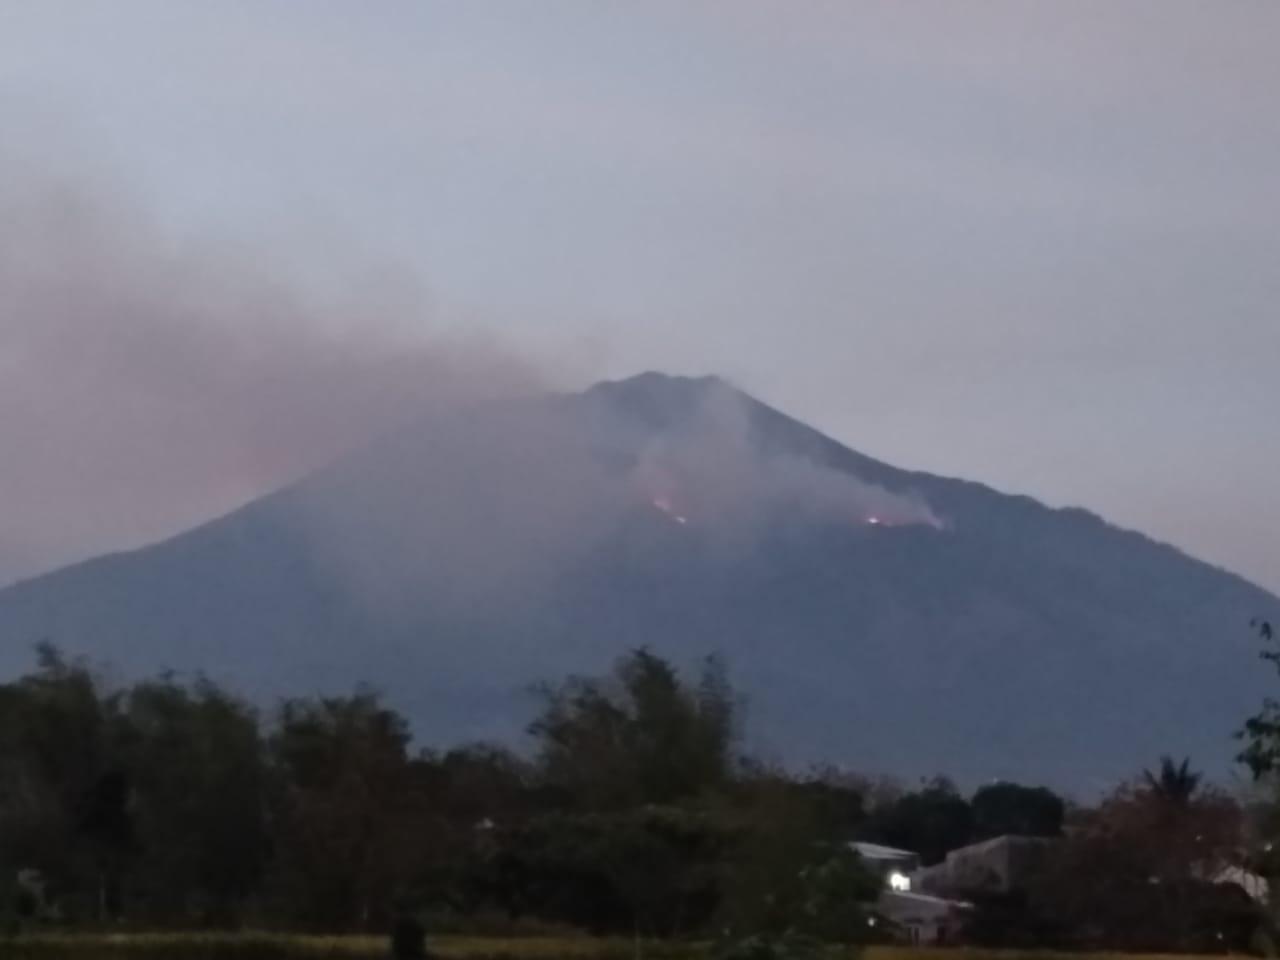 https: img.okezone.com content 2019 10 12 519 2115949 hutan-gunung-arjuno-terbakar-kobaran-api-terlihat-hingga-malang-tROaFgxVil.jpg